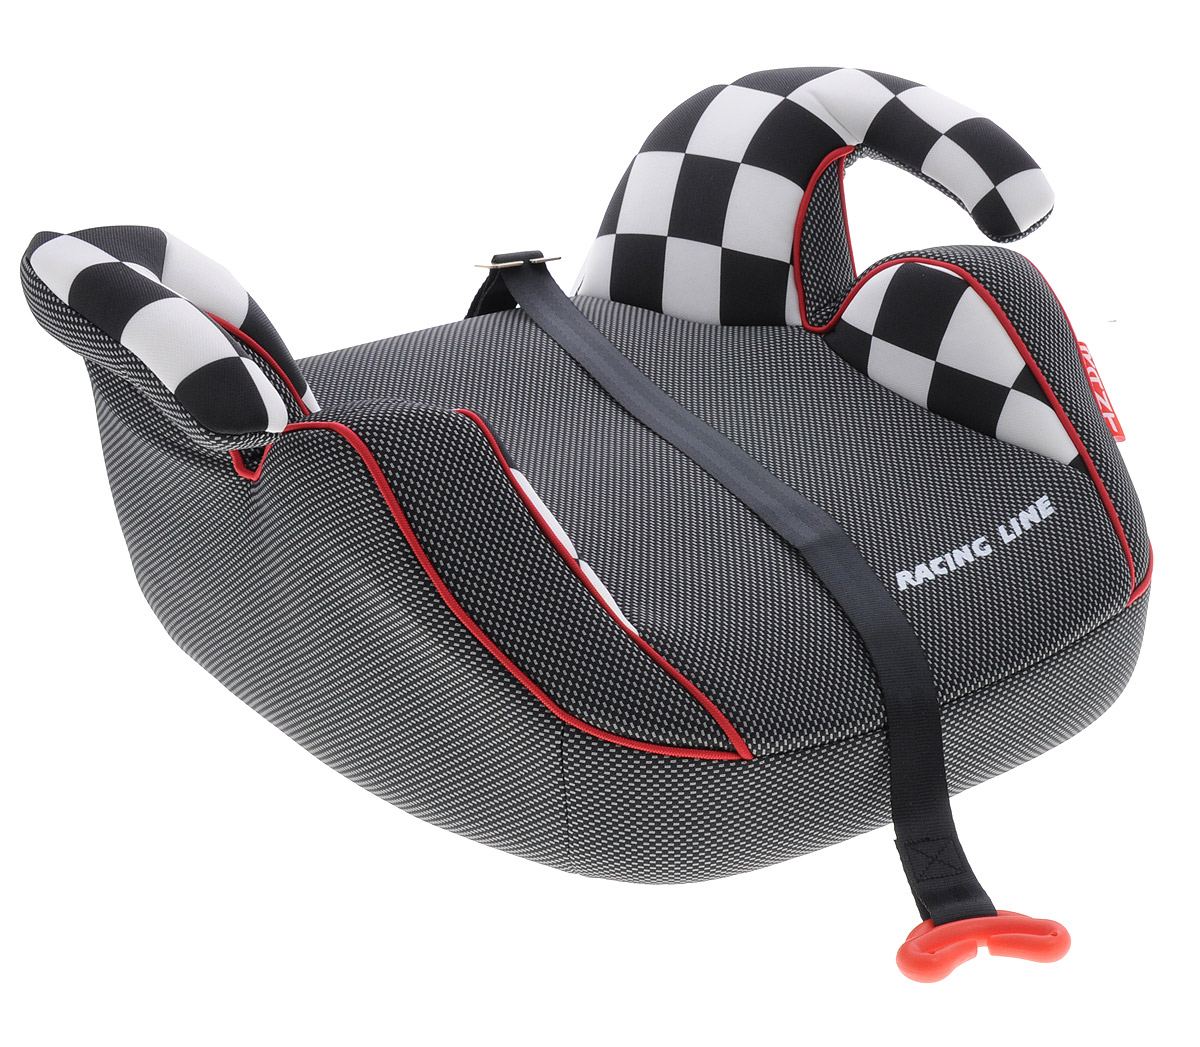 Rant Бустер Racer 15-36 кг цвет черный серый белый